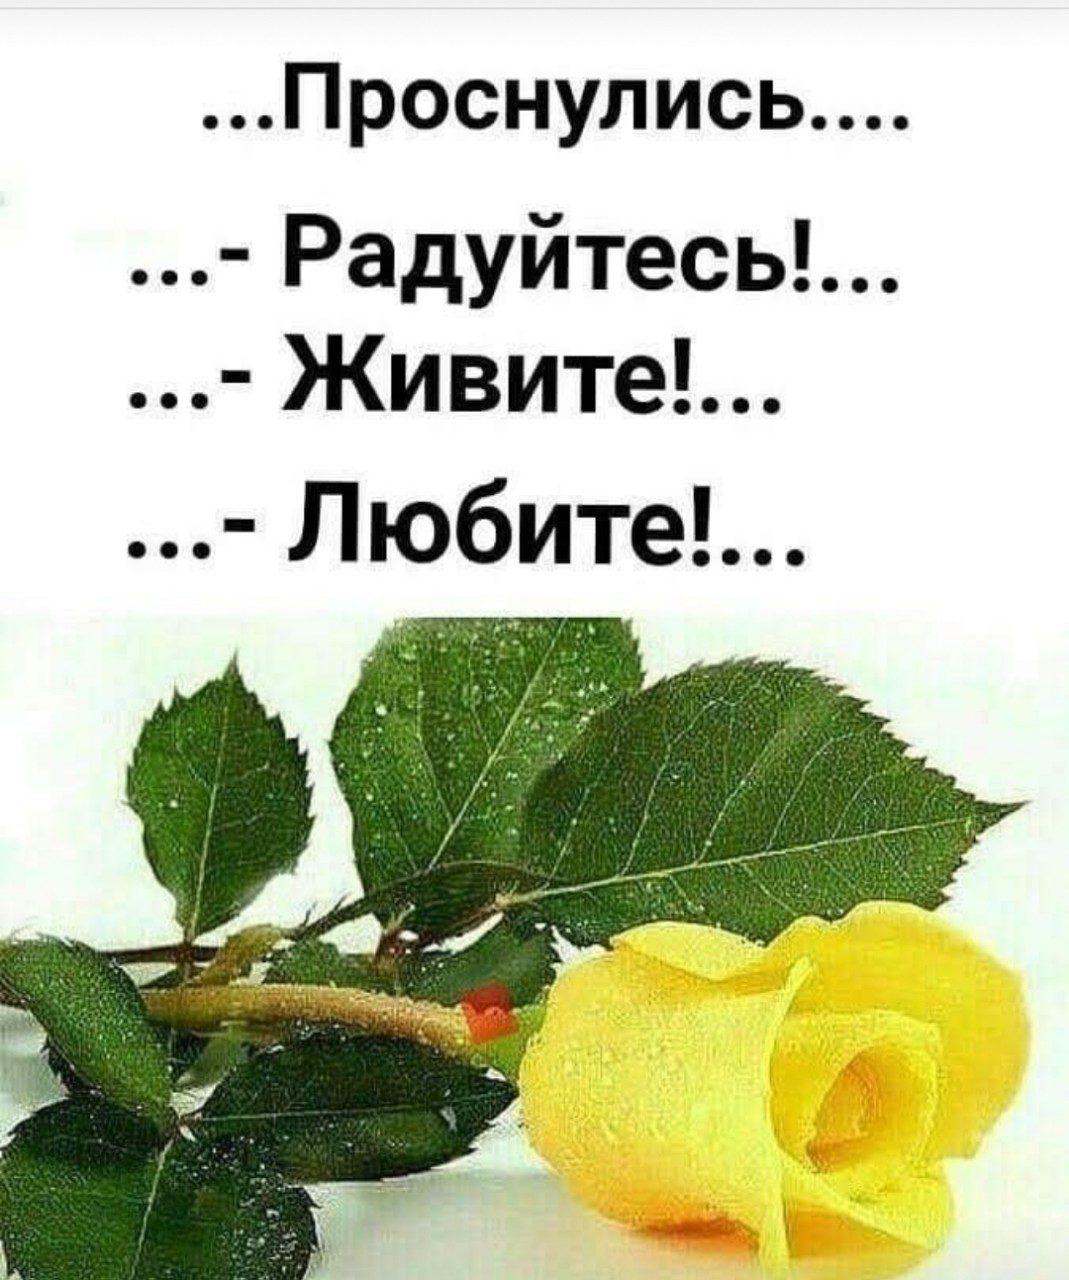 Odnoklassniki Dobroe Utro Utrennie Citaty Motivacionnye Kartinki